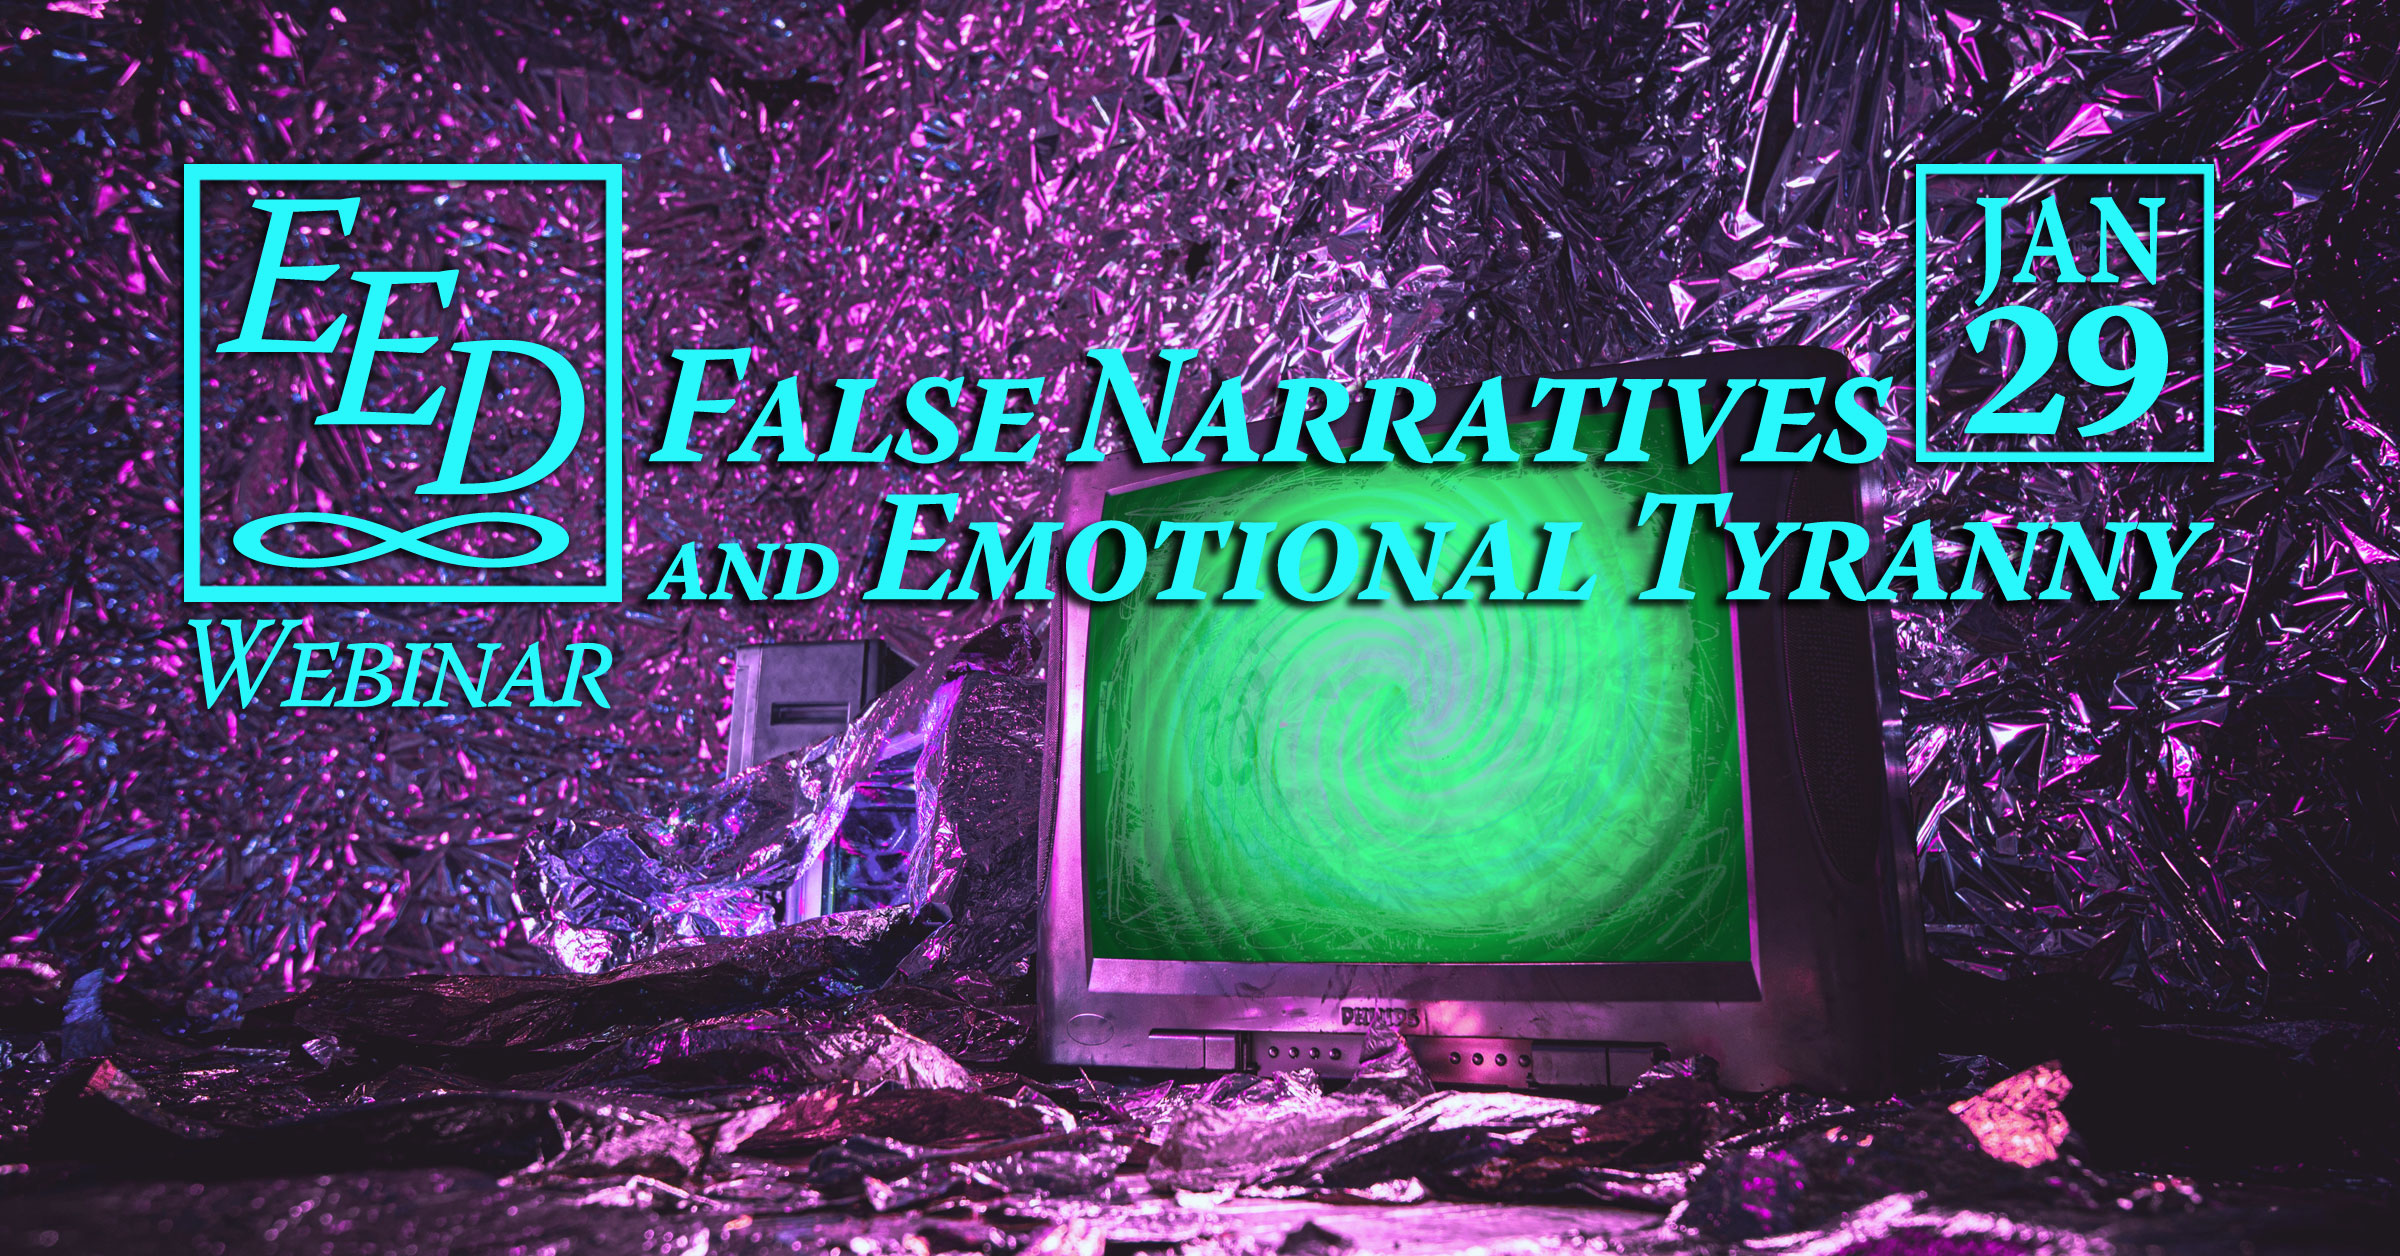 WB2-20: False Narratives